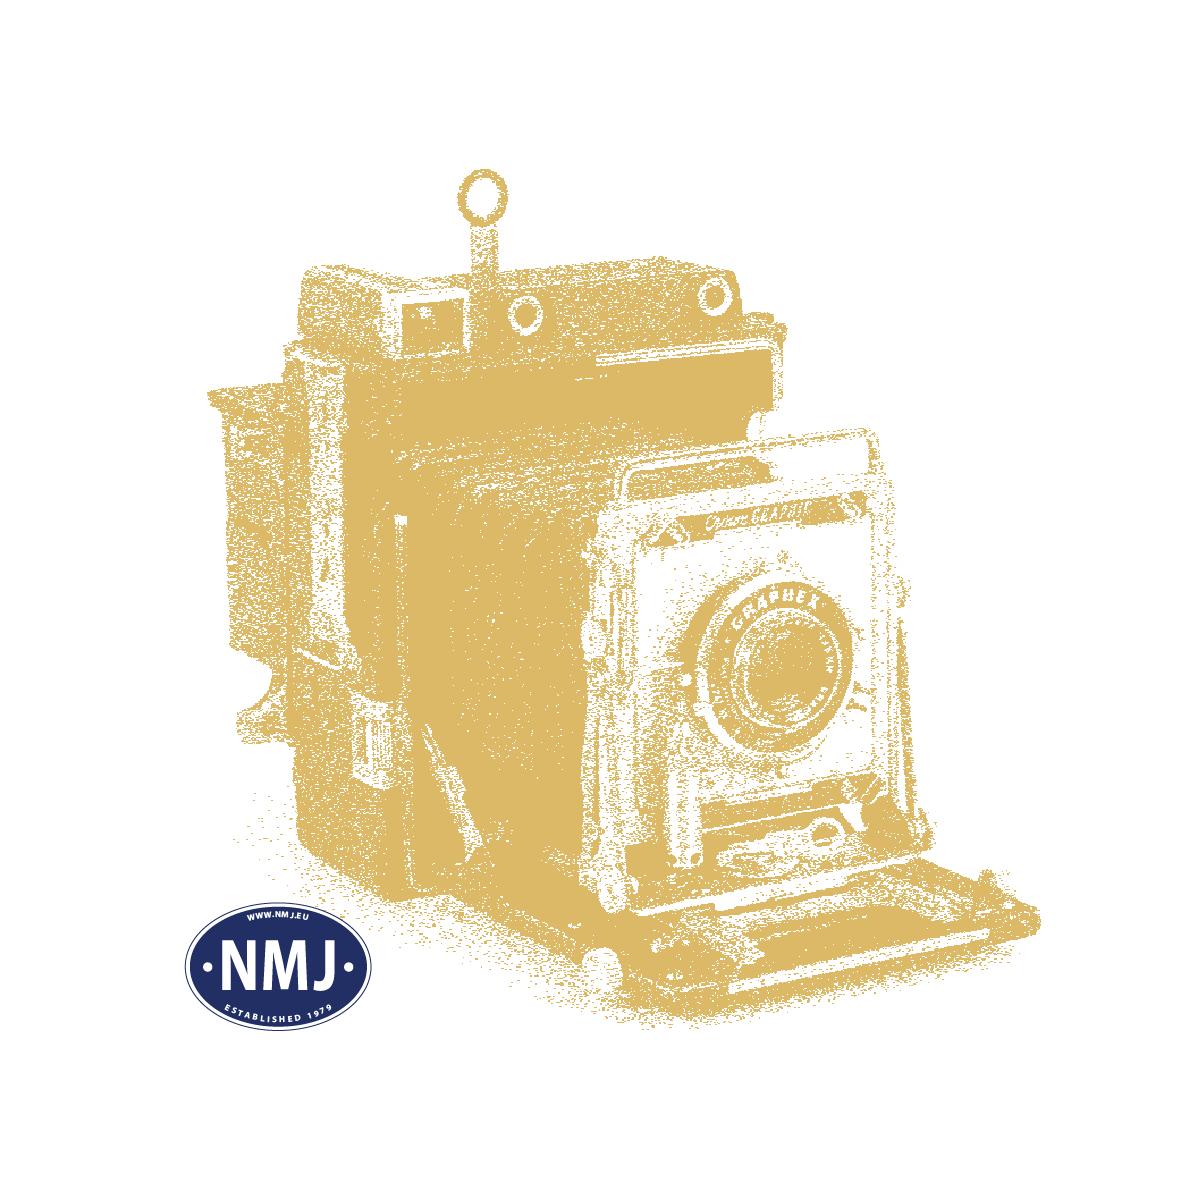 NMJT245301 - NMJ Topline CFL 1601, Spur 0, DCC m/ Sound